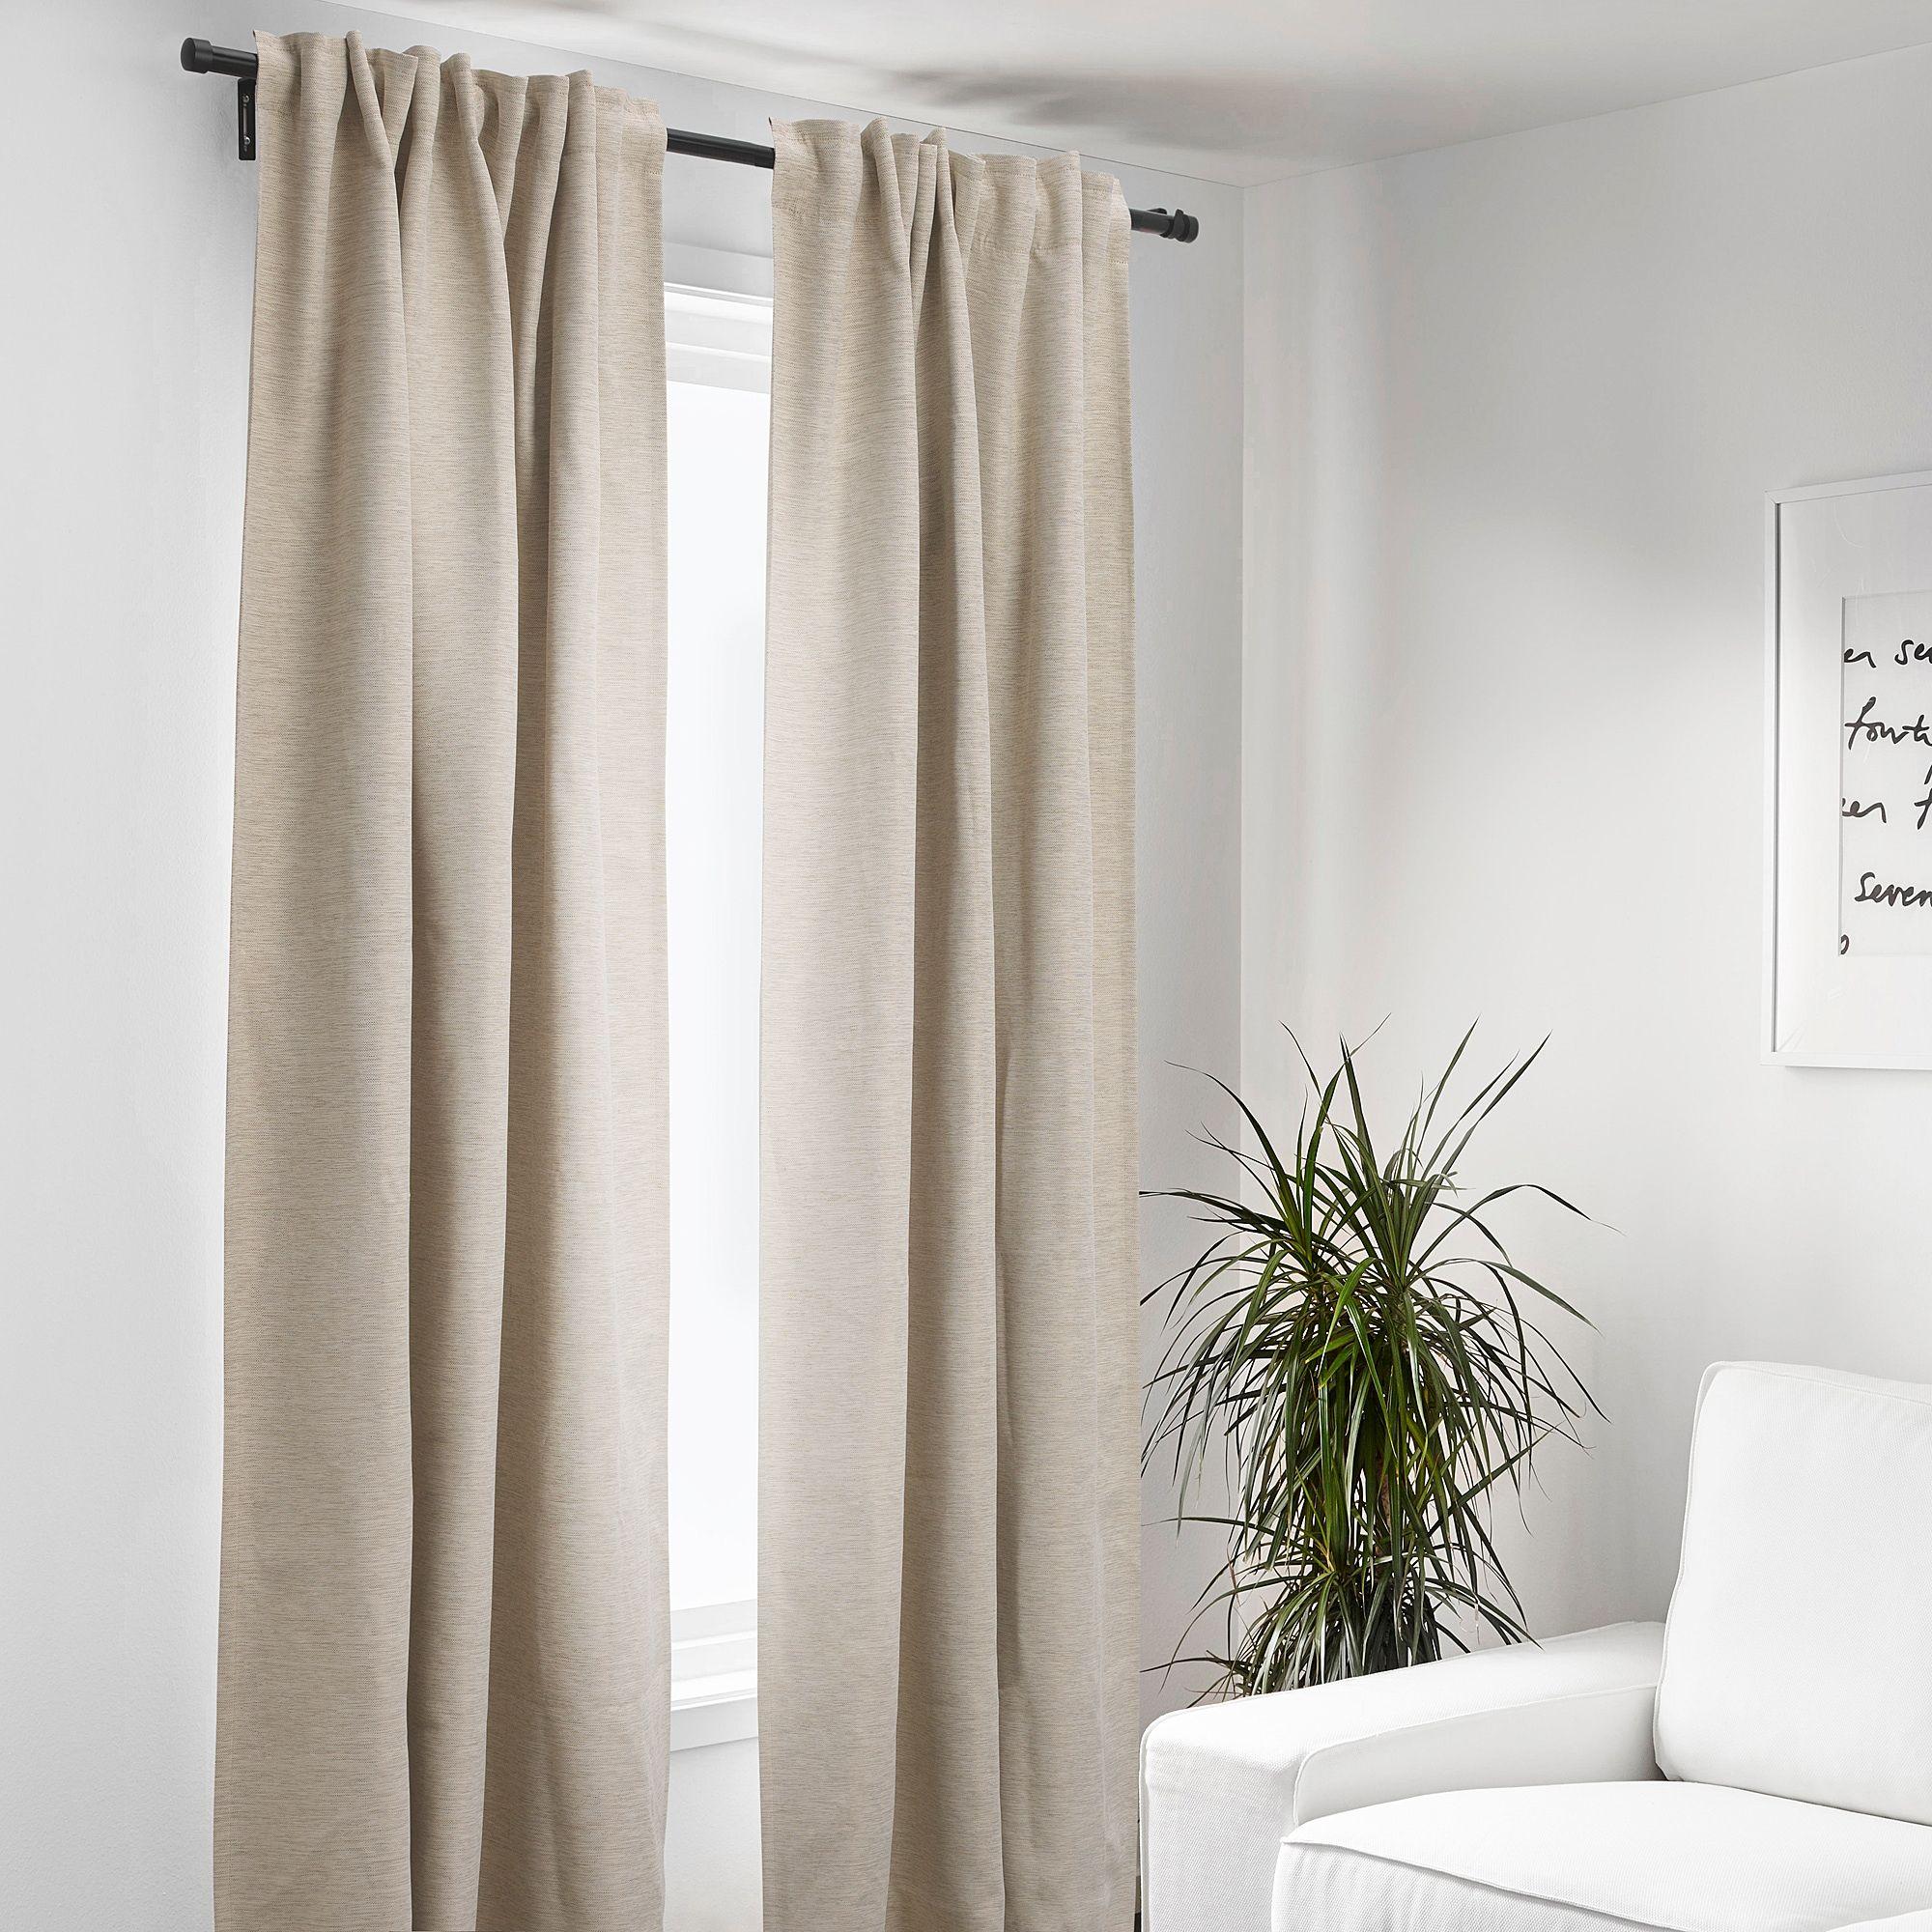 Kalamondin Room Darkening Curtains 1 Pair Beige Ikea Beige